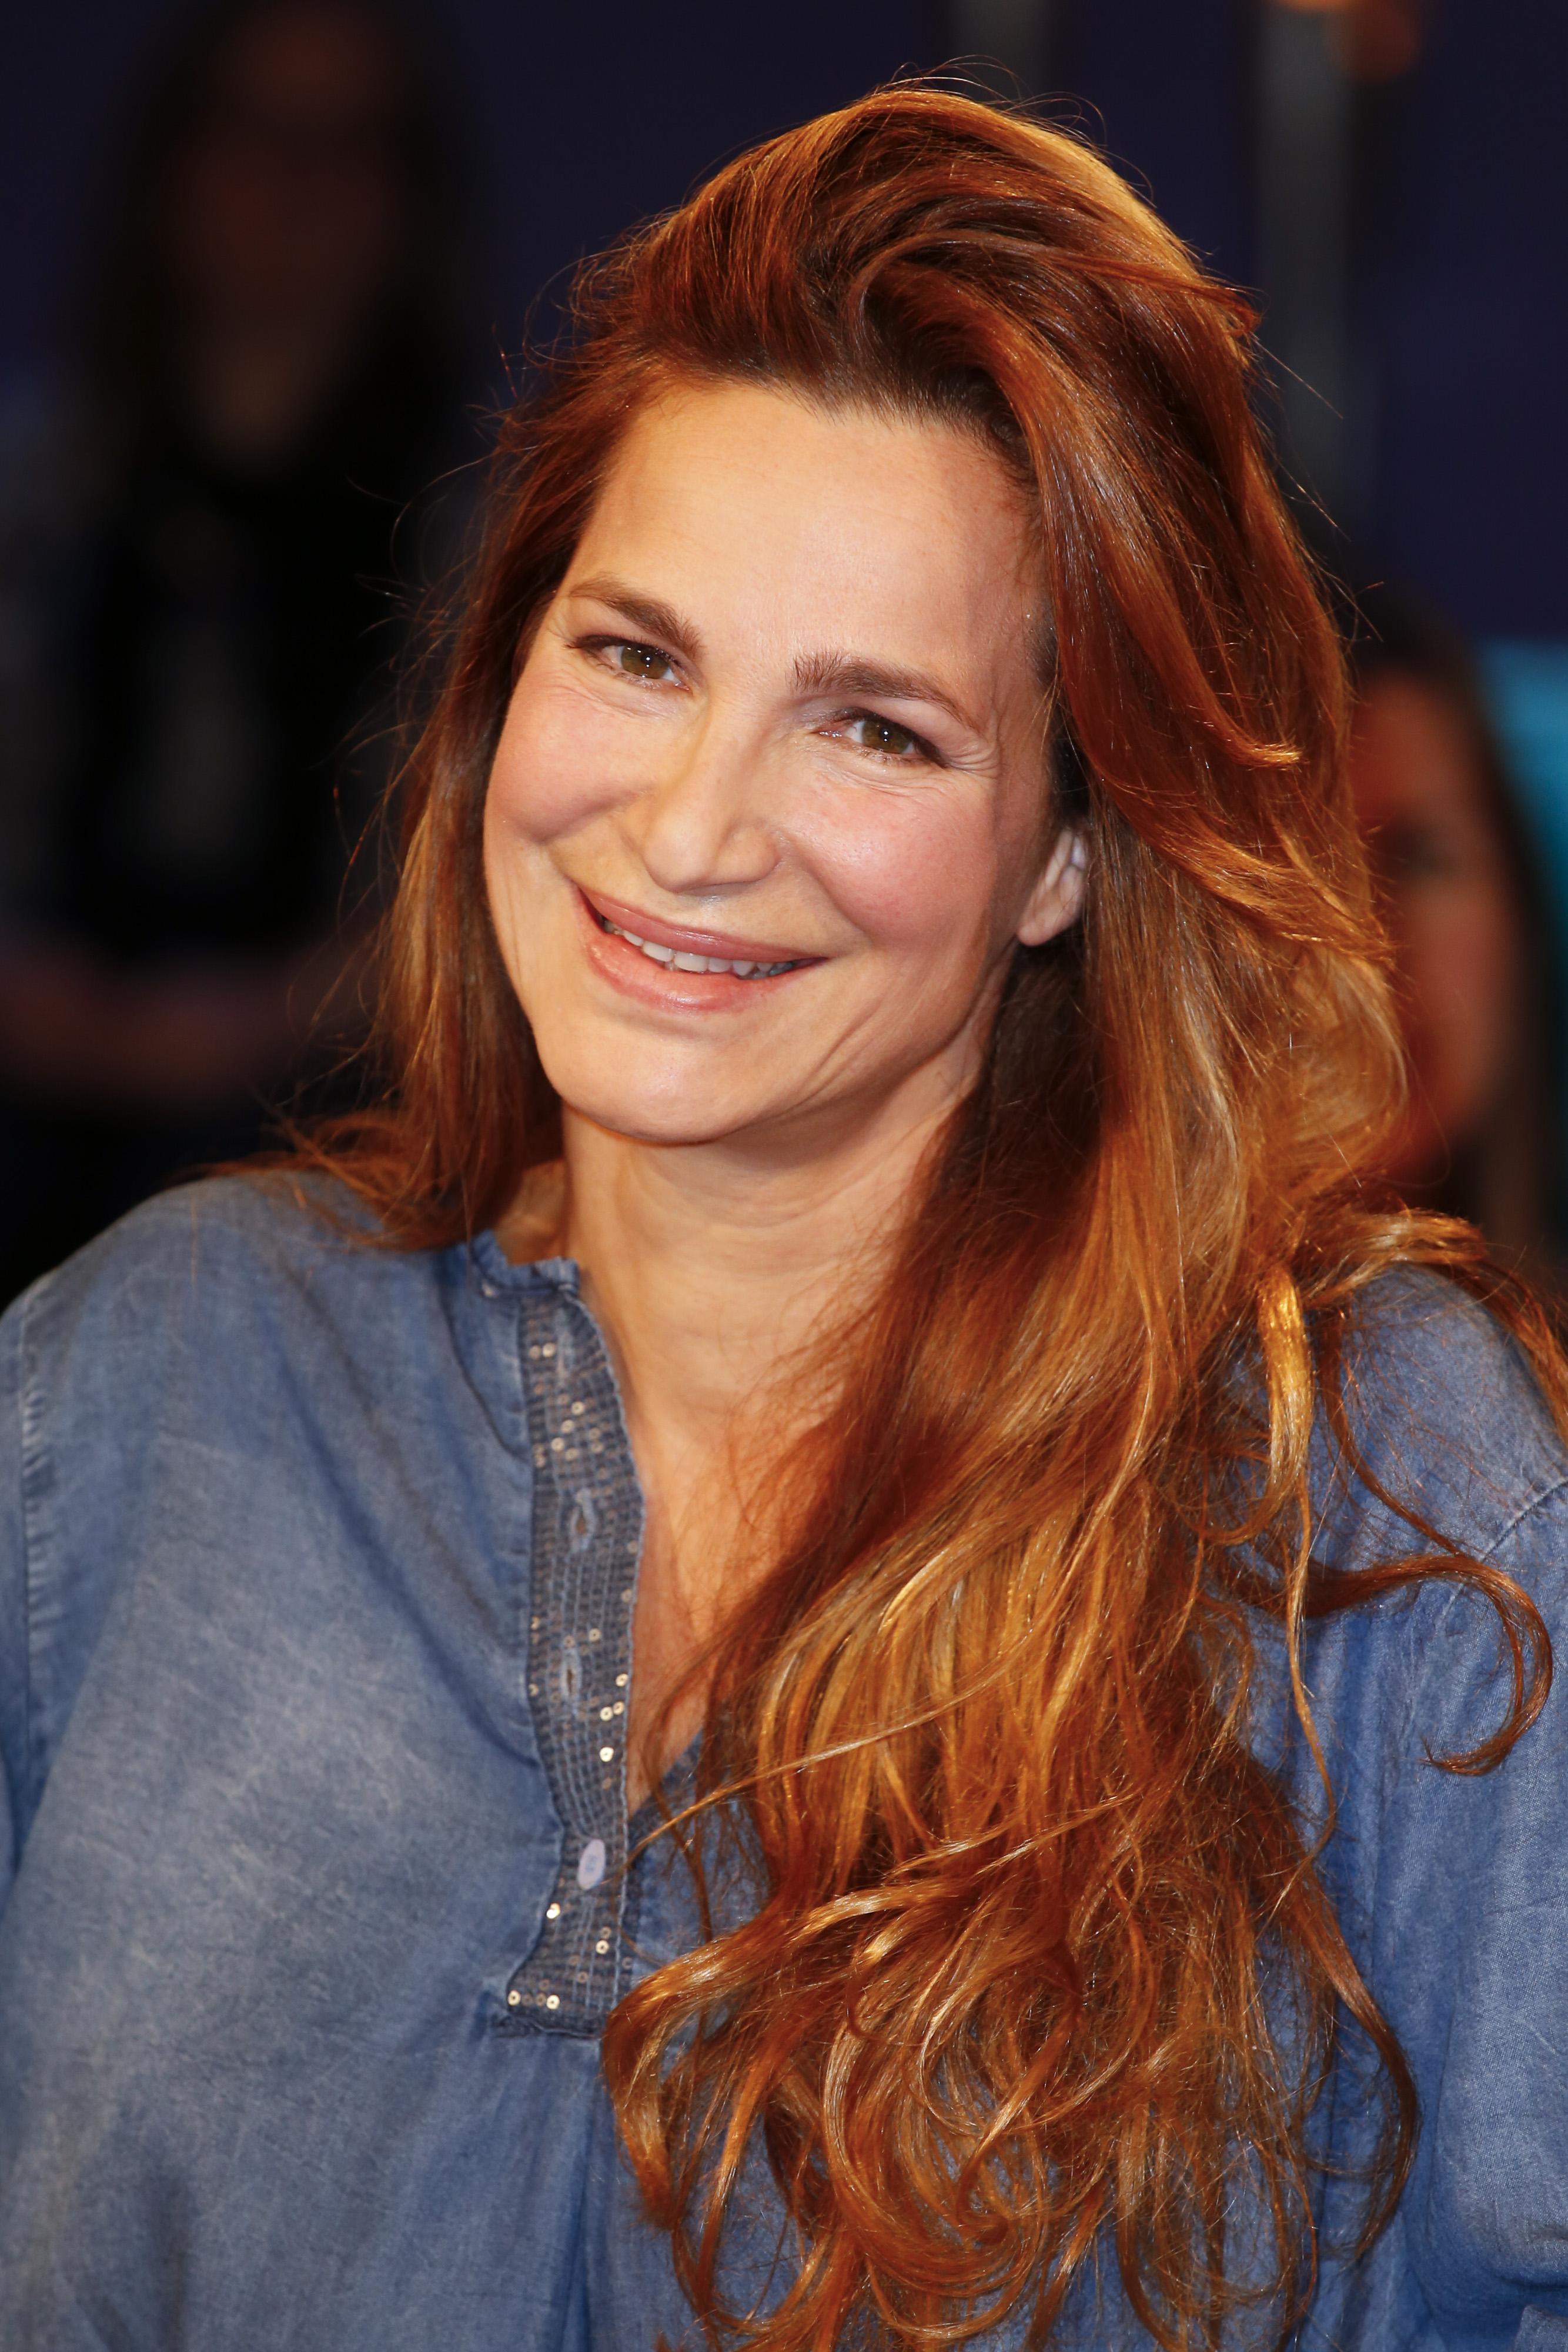 Datei:Alexandra Kamp Schauspielerin.jpg - Wikipedia